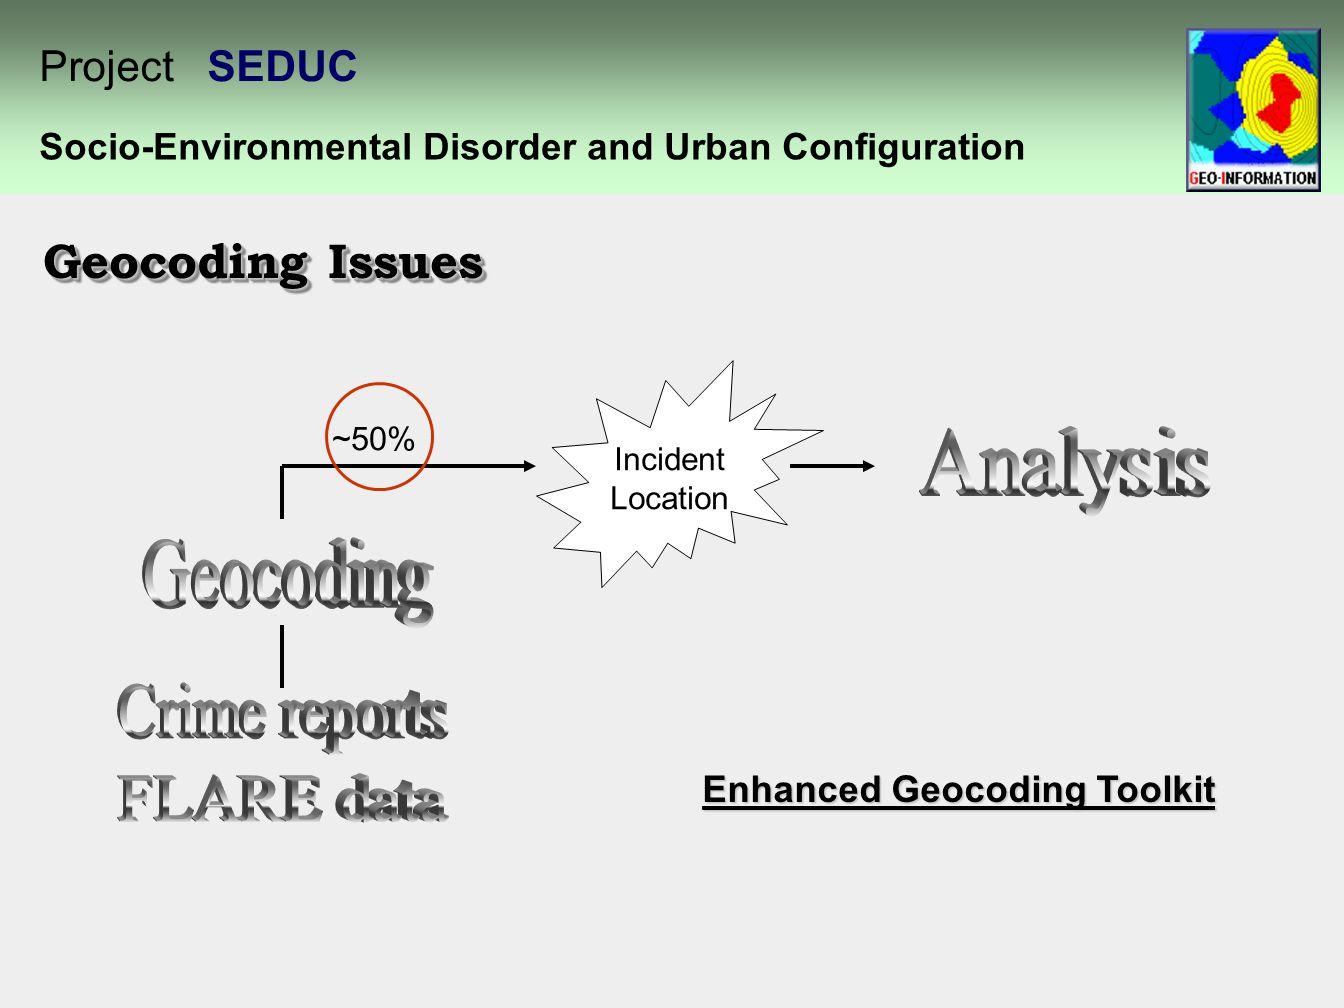 Incident Location ~50% Socio-Environmental Disorder and Urban Configuration Project SEDUC Geocoding Issues Enhanced Geocoding Toolkit